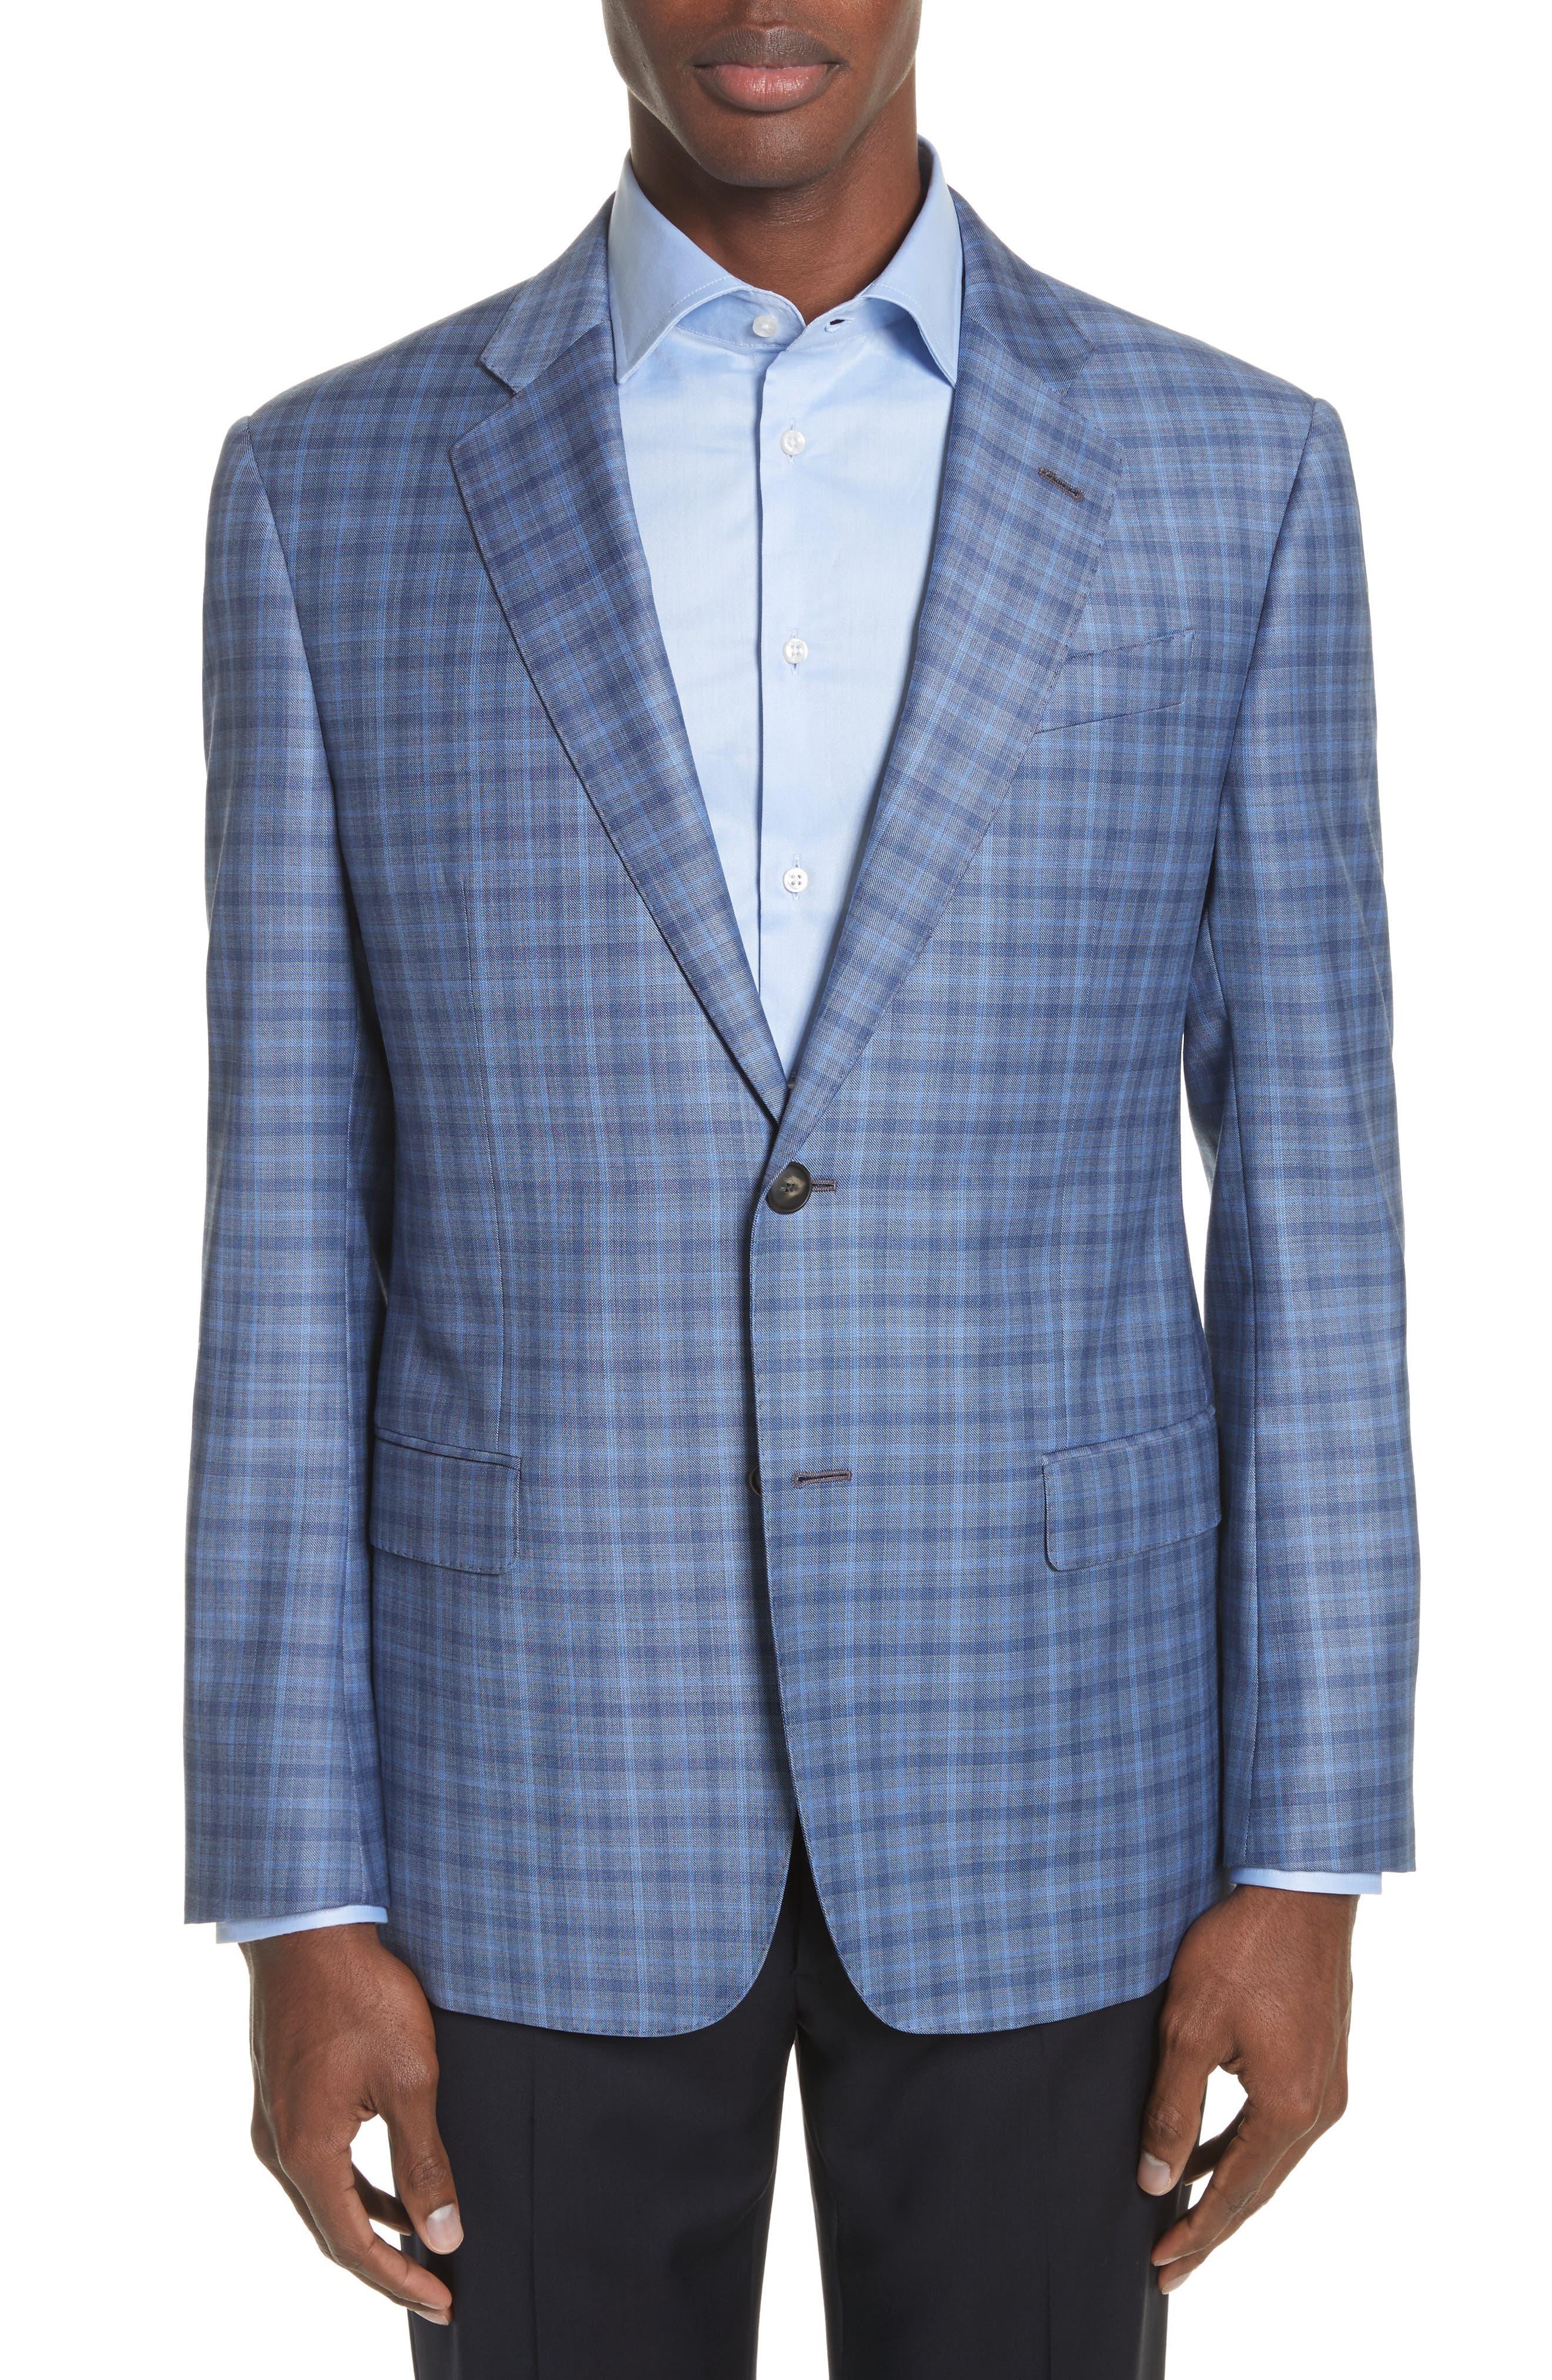 Alternate Image 1 Selected - Emporio Armani G Line Trim Fit Plaid Wool Sport Coat